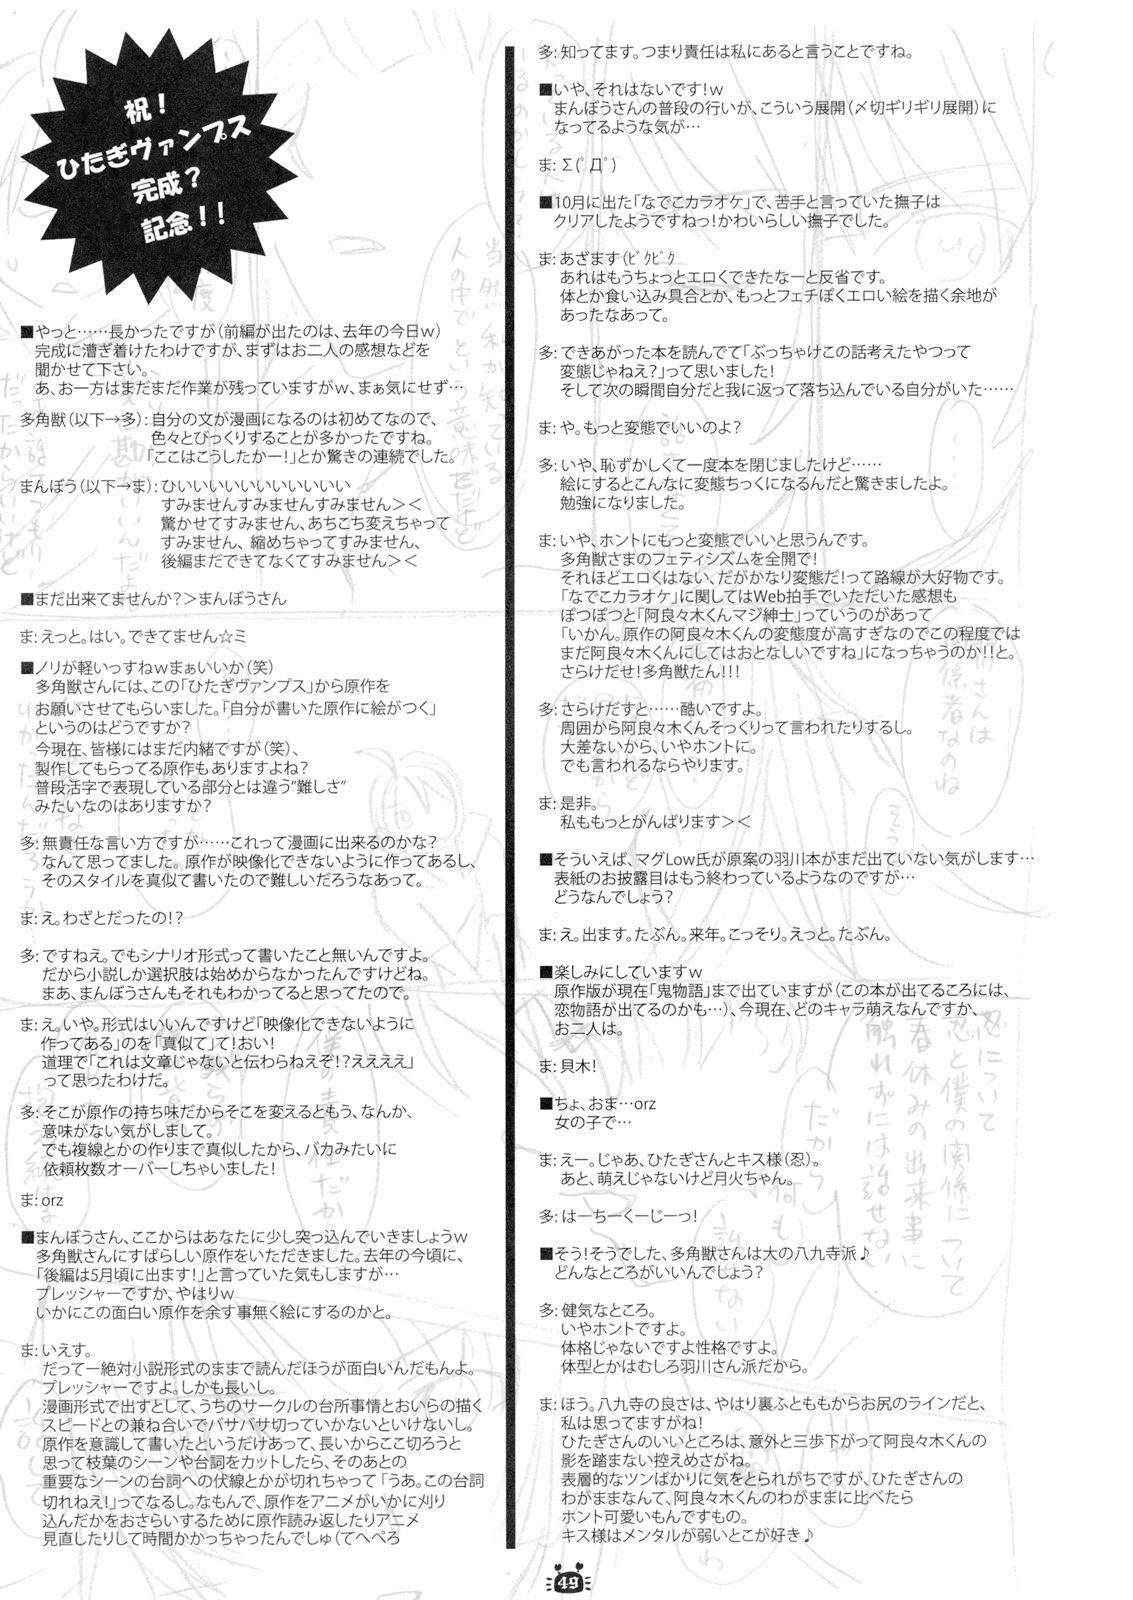 Hitagi Vamps Kouhen - Hitagi Vamps Part 2 47